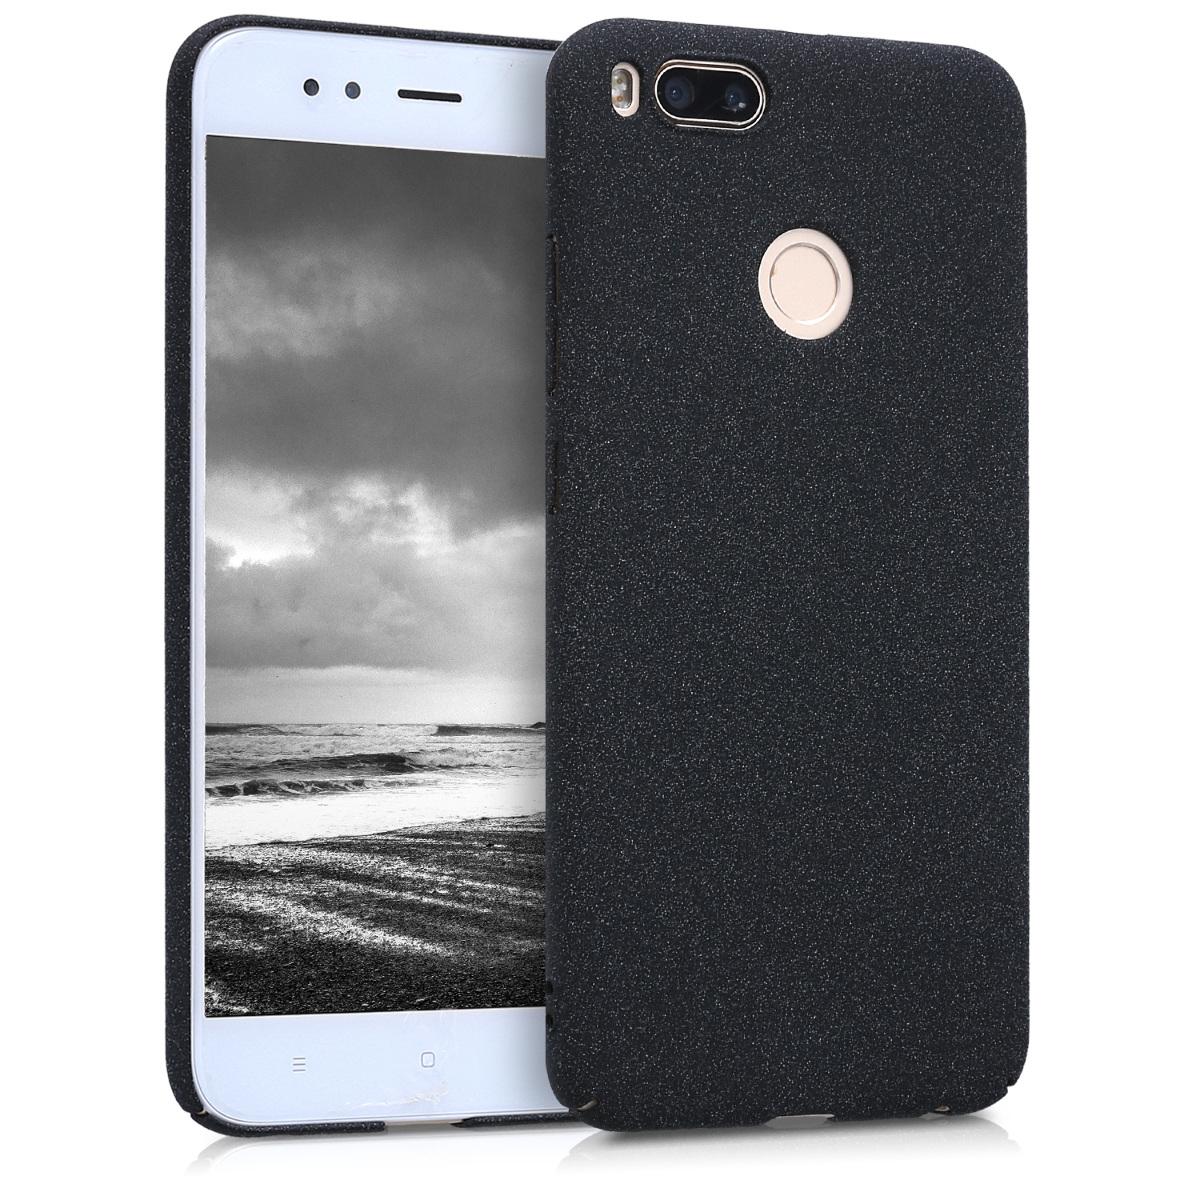 KW Slim Anti-Slip Cover - Σκληρή Θήκη Καουτσούκ Xiaomi Mi 5X / Mi A1 - Μαύρο μεταλλικό (44681.68)